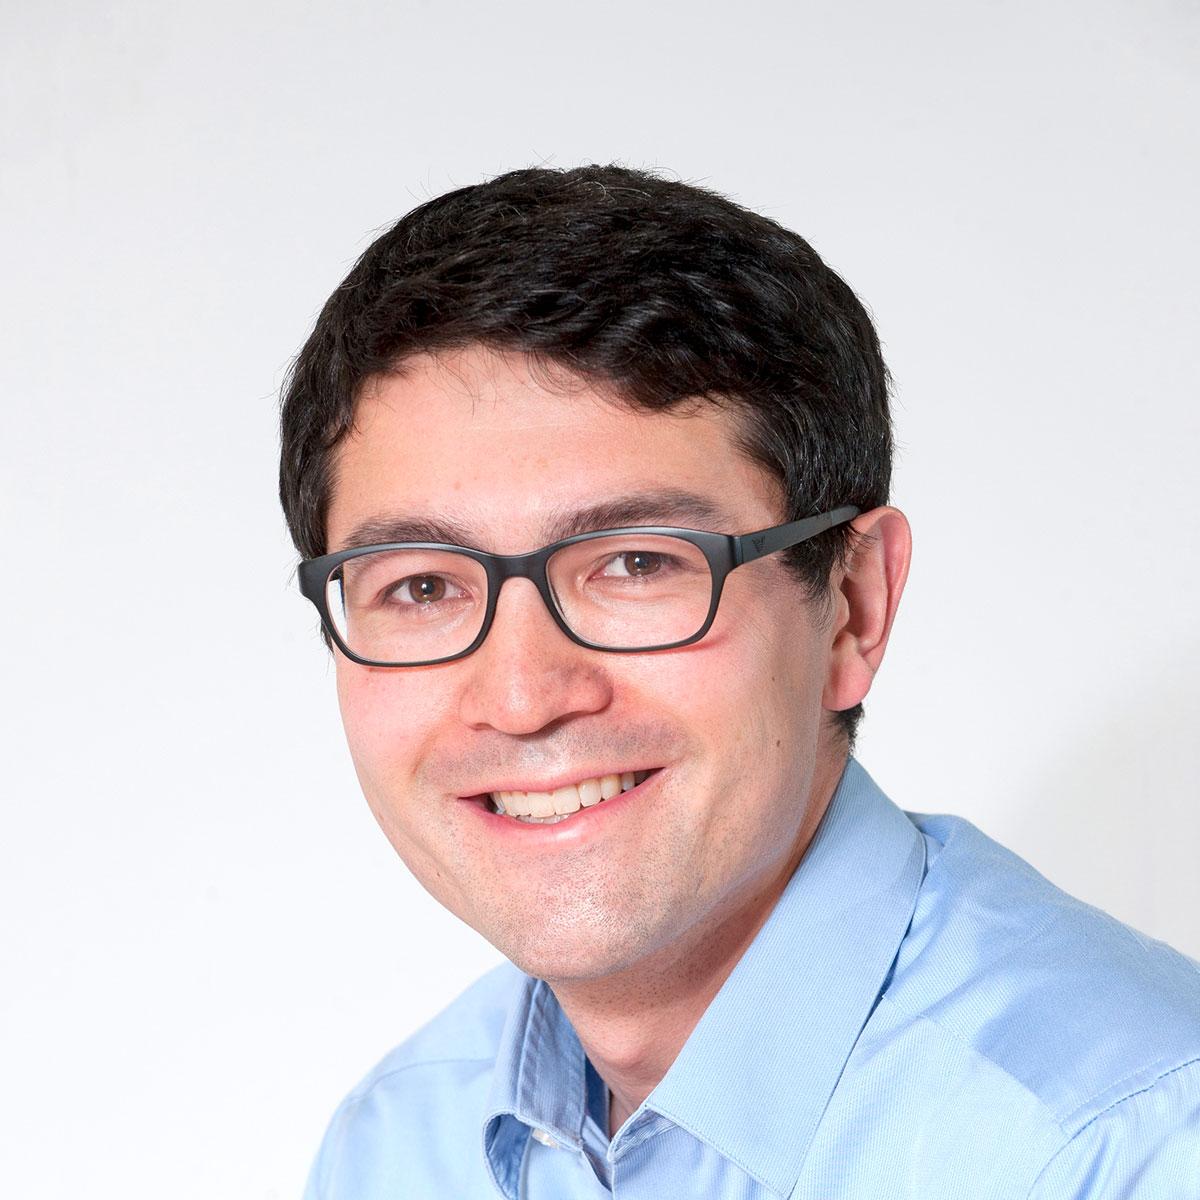 Seigo Robinson - Associate Circular Economy SpecialistTalk to Seigo about: Circular economy, international policy, market evaluation